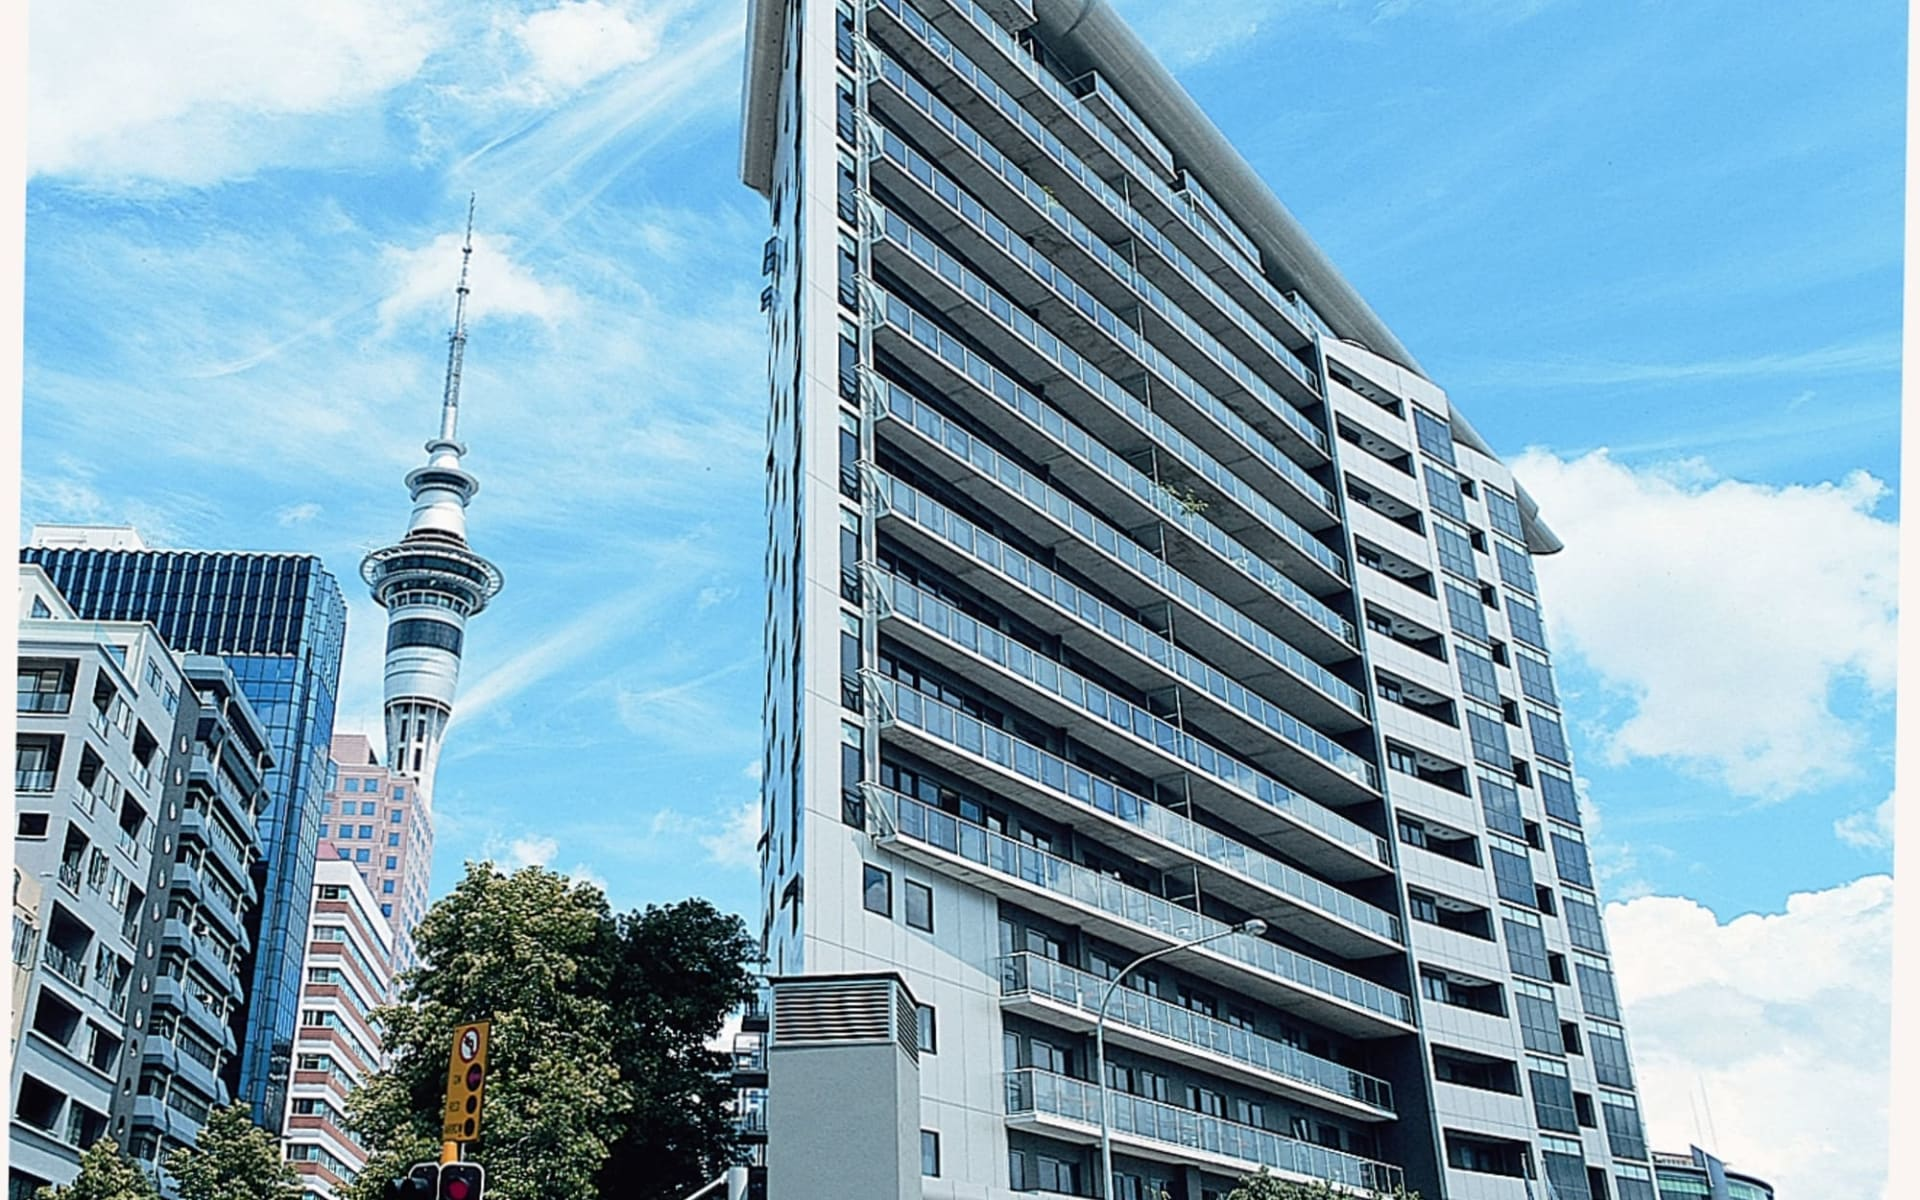 Grand Chancellor Auckland City:  Hotel Grand Chancellor AKL